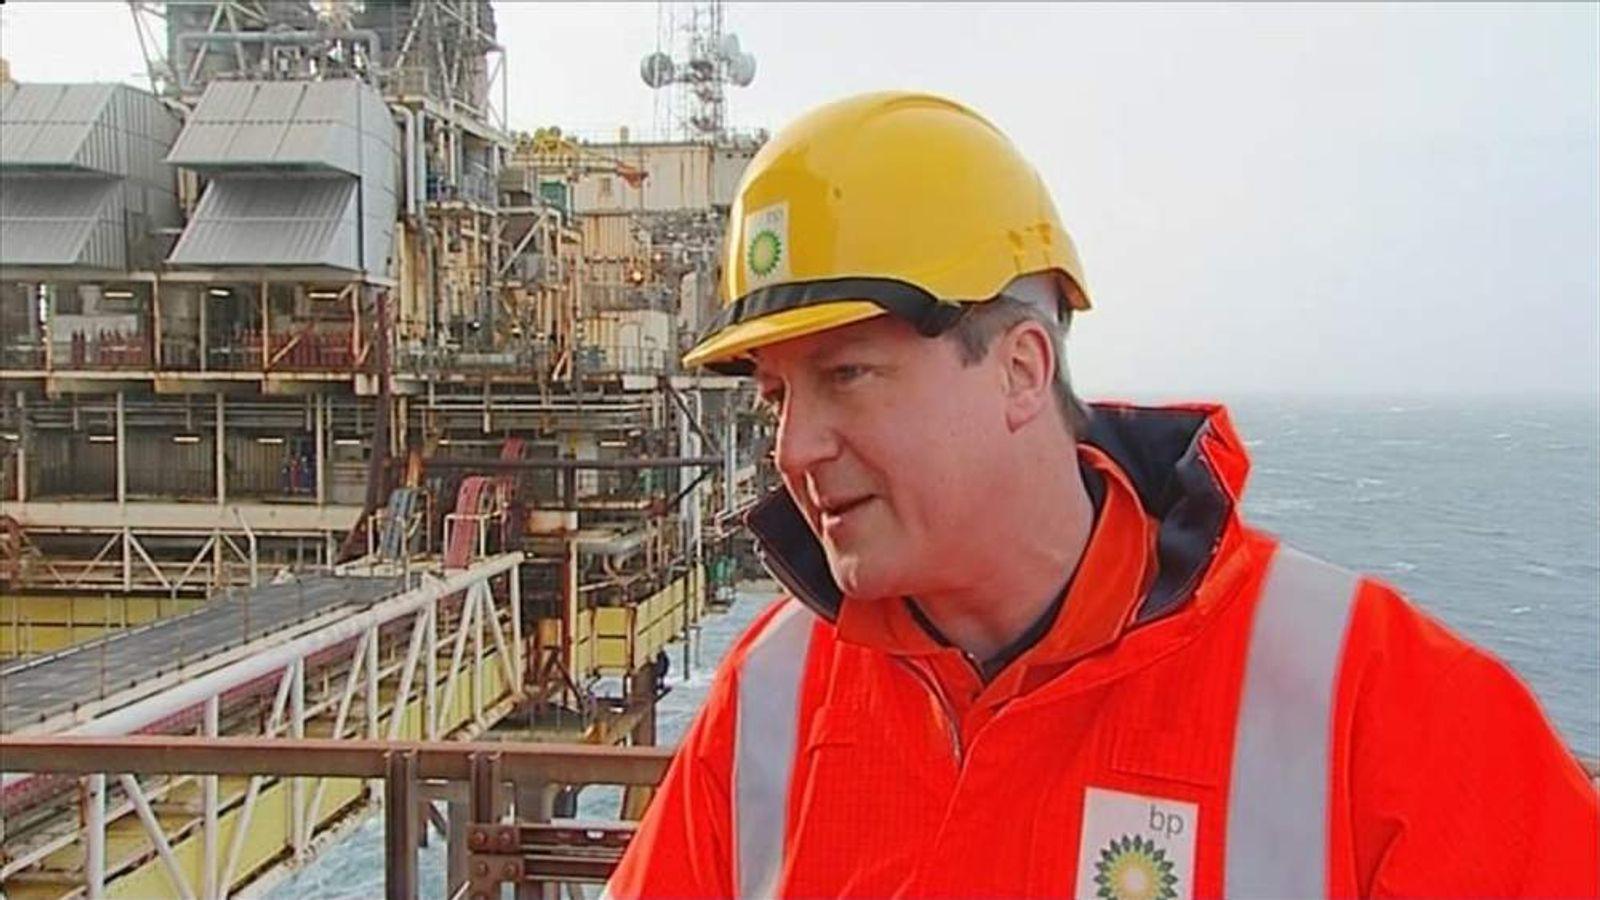 240214 UK POL David Cameron North Sea Oil Rig BP